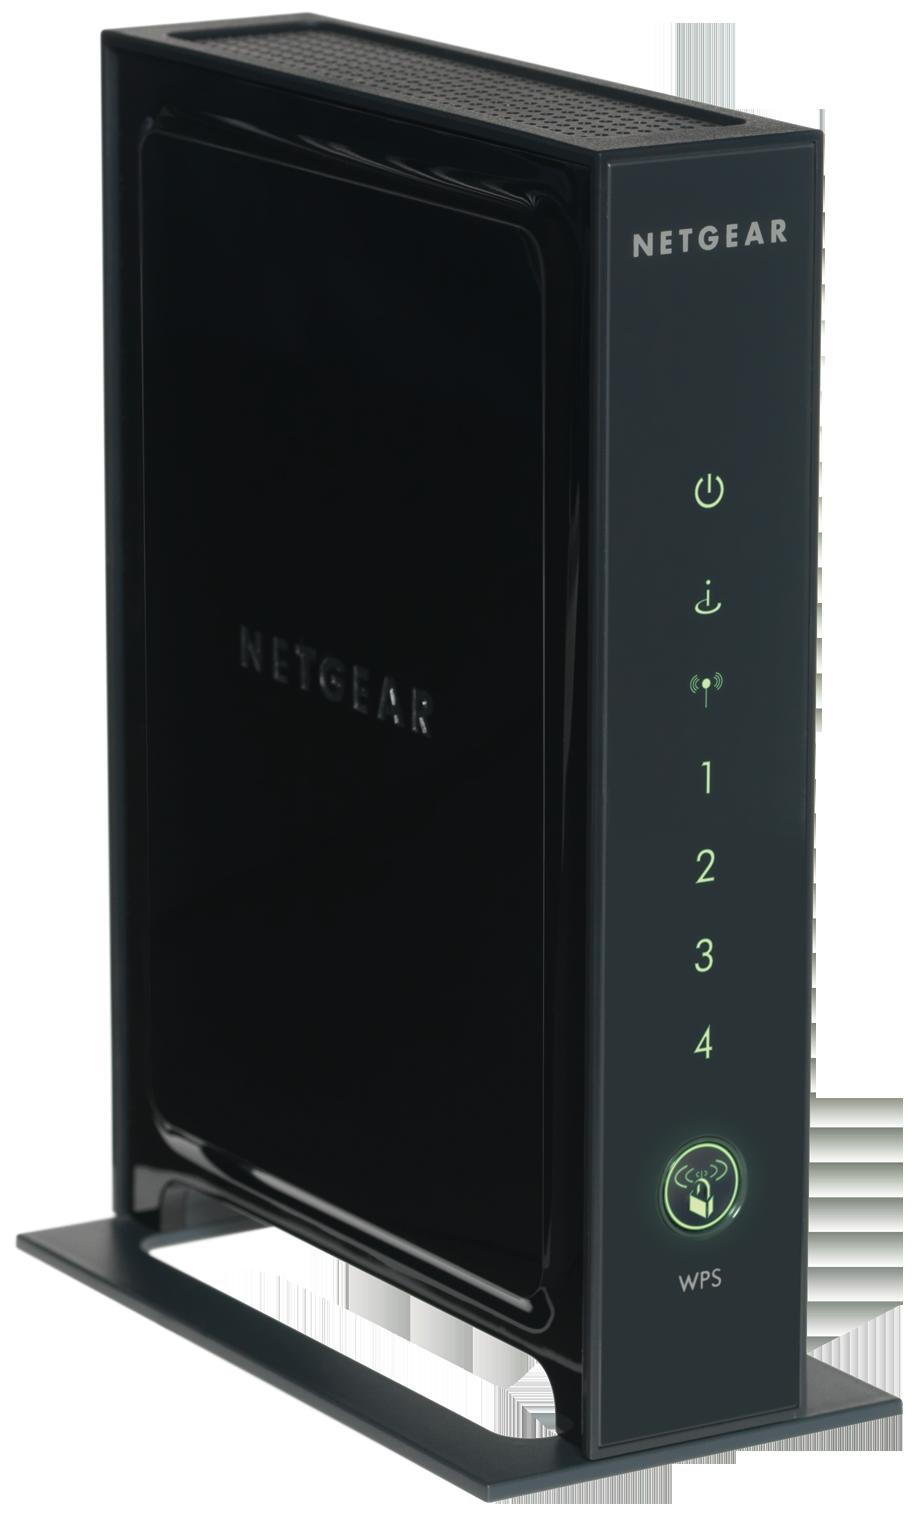 netgear n300 wireless router wnr2000 setup manual